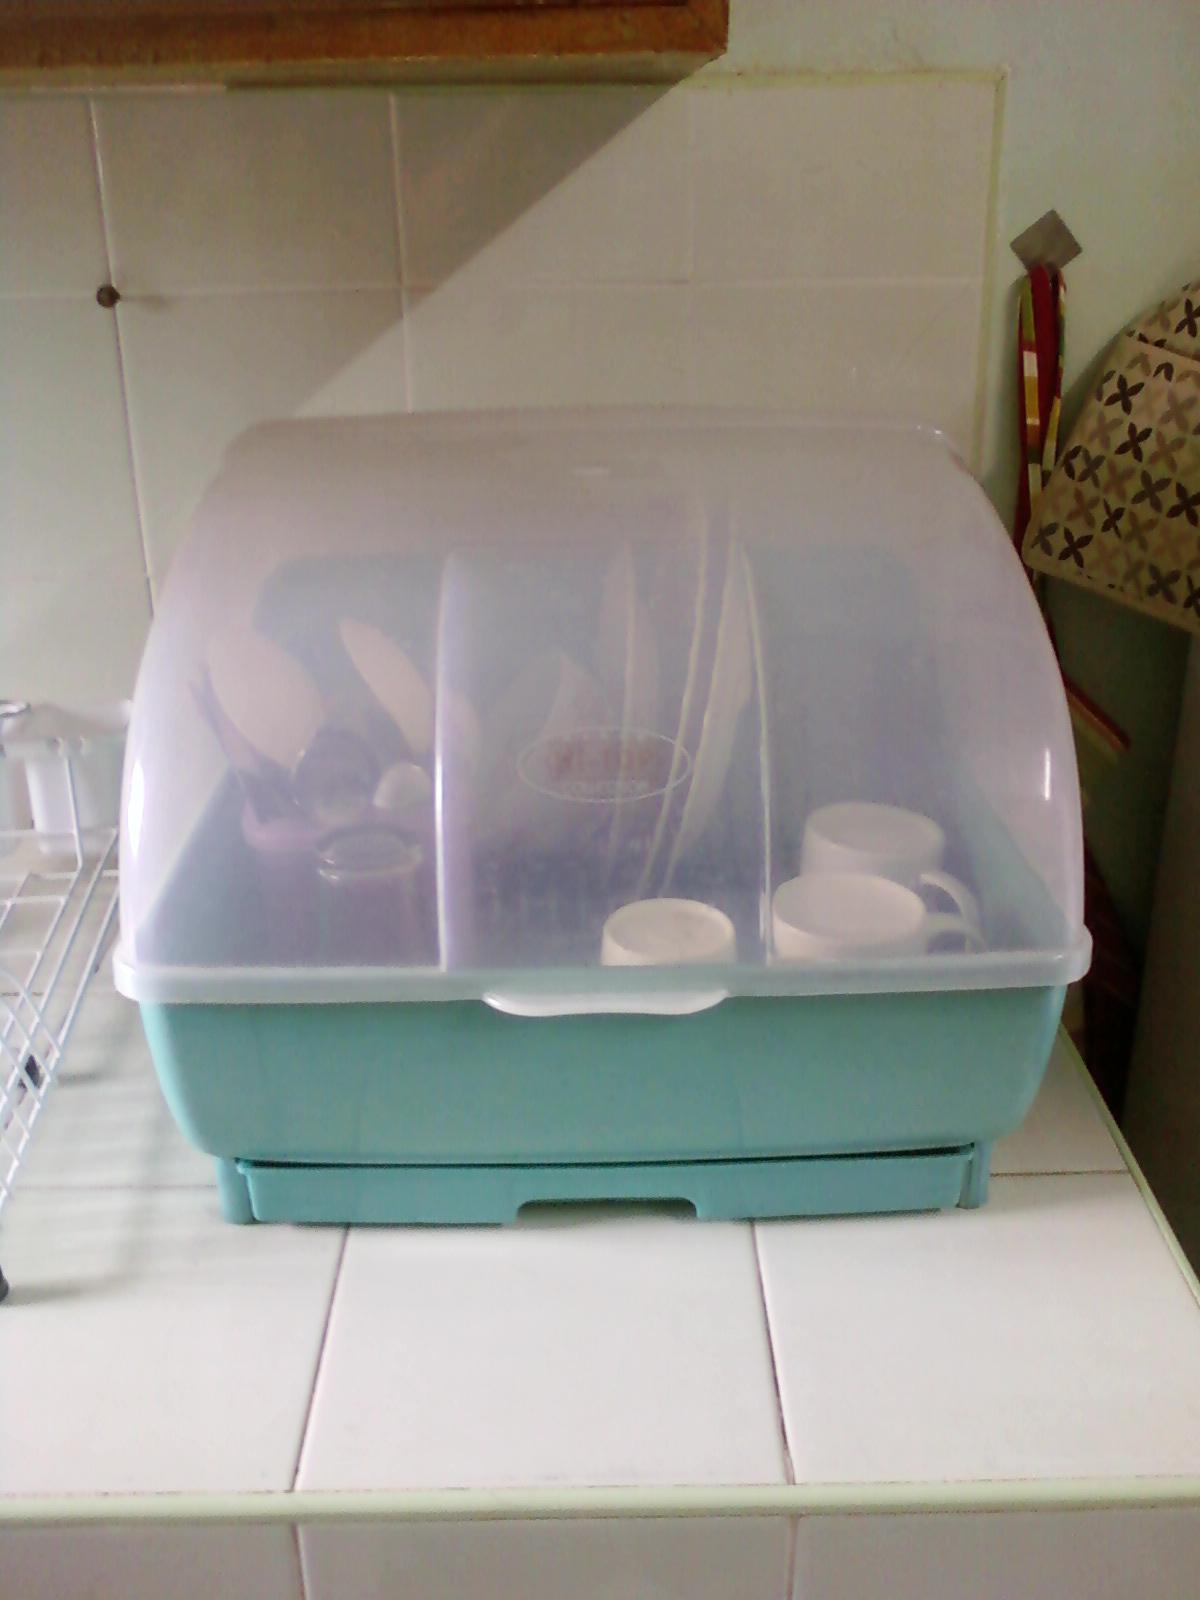 house keeping dish rack cover. Black Bedroom Furniture Sets. Home Design Ideas